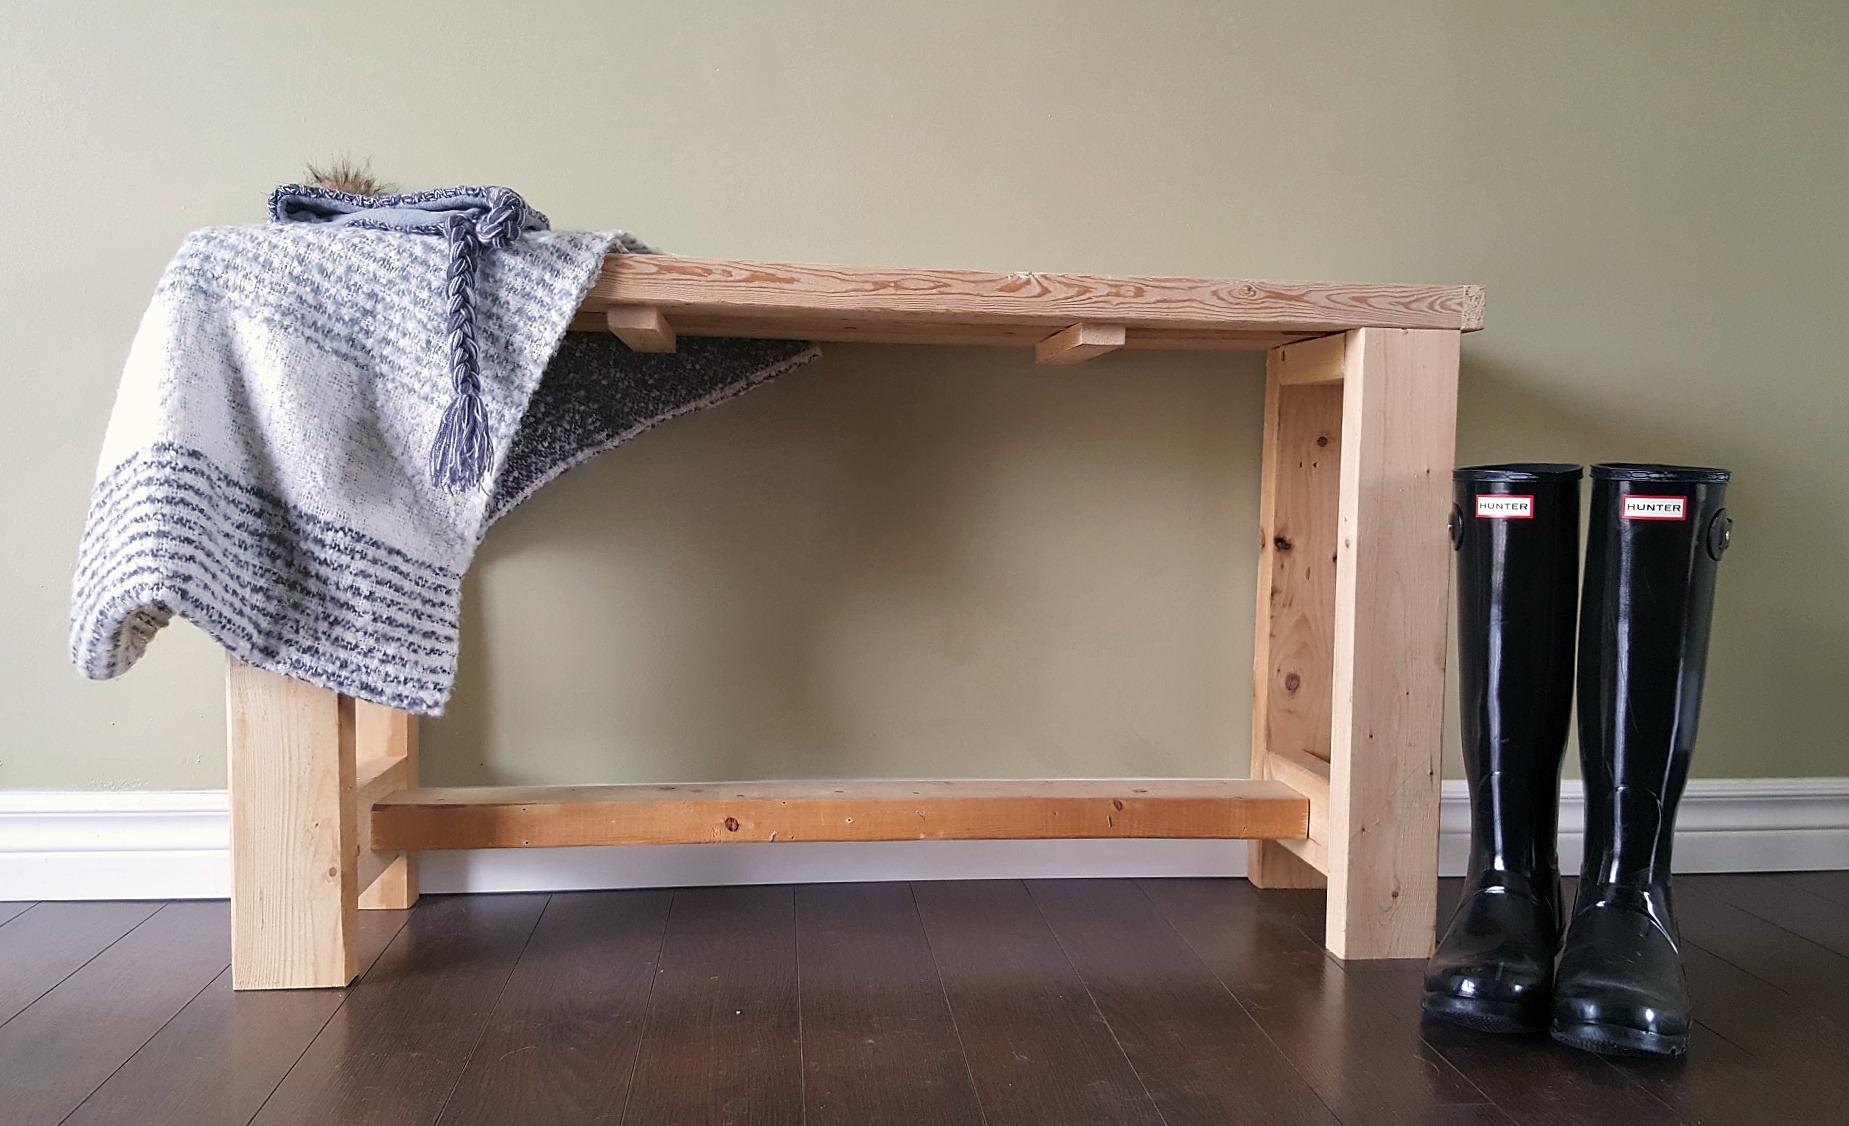 Scrap wood entry bench 2x4